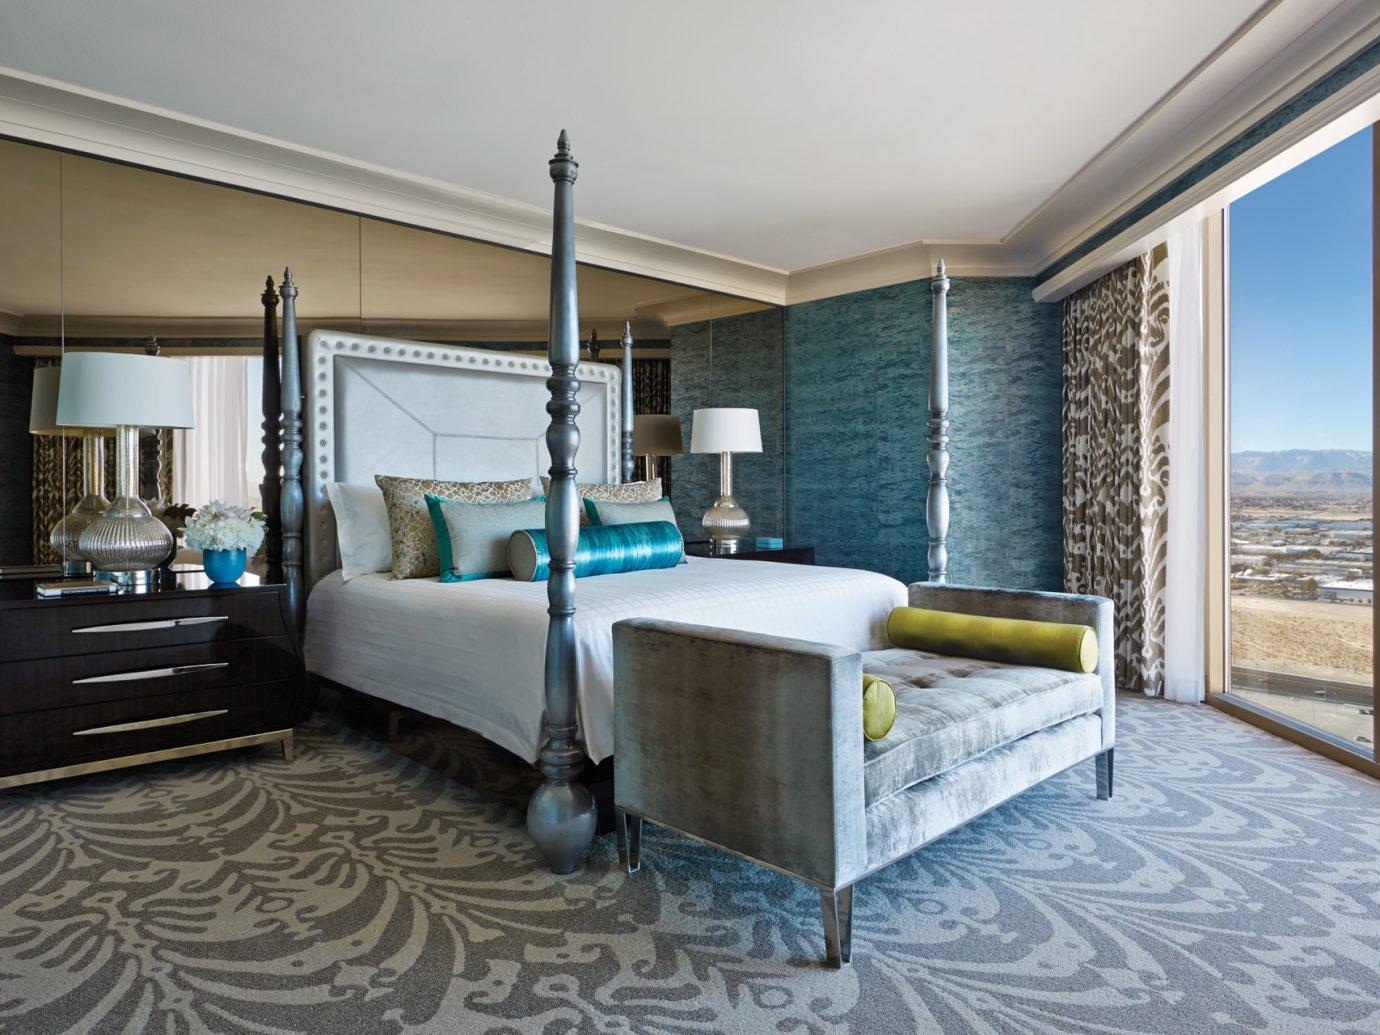 Bedroom in the Presidential suite at the Four Seasons Las Vegas